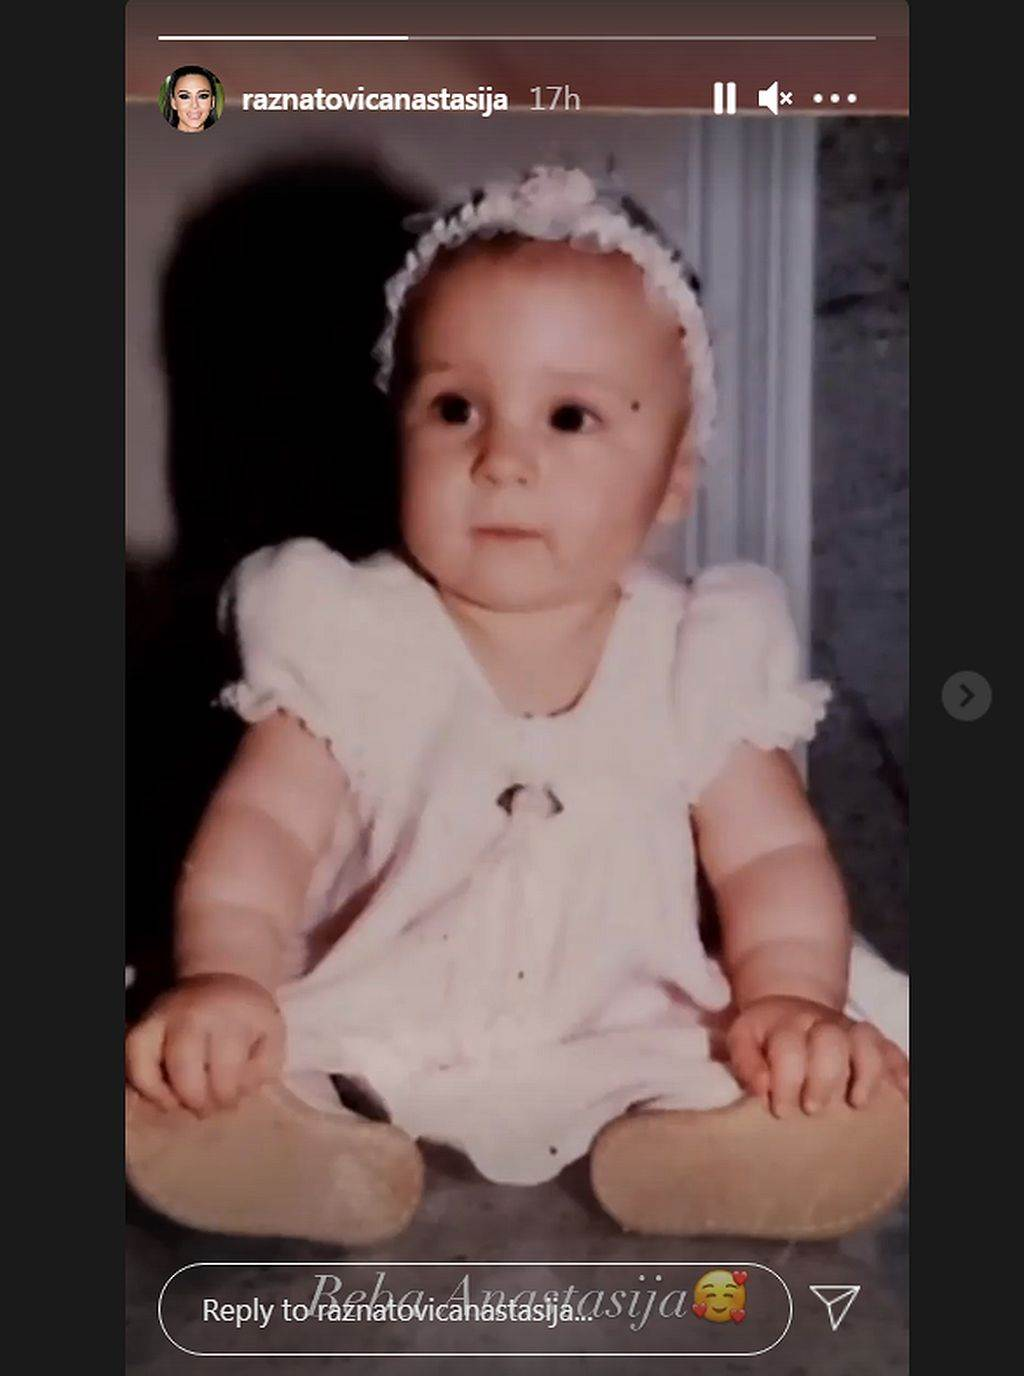 Beba Anastasija